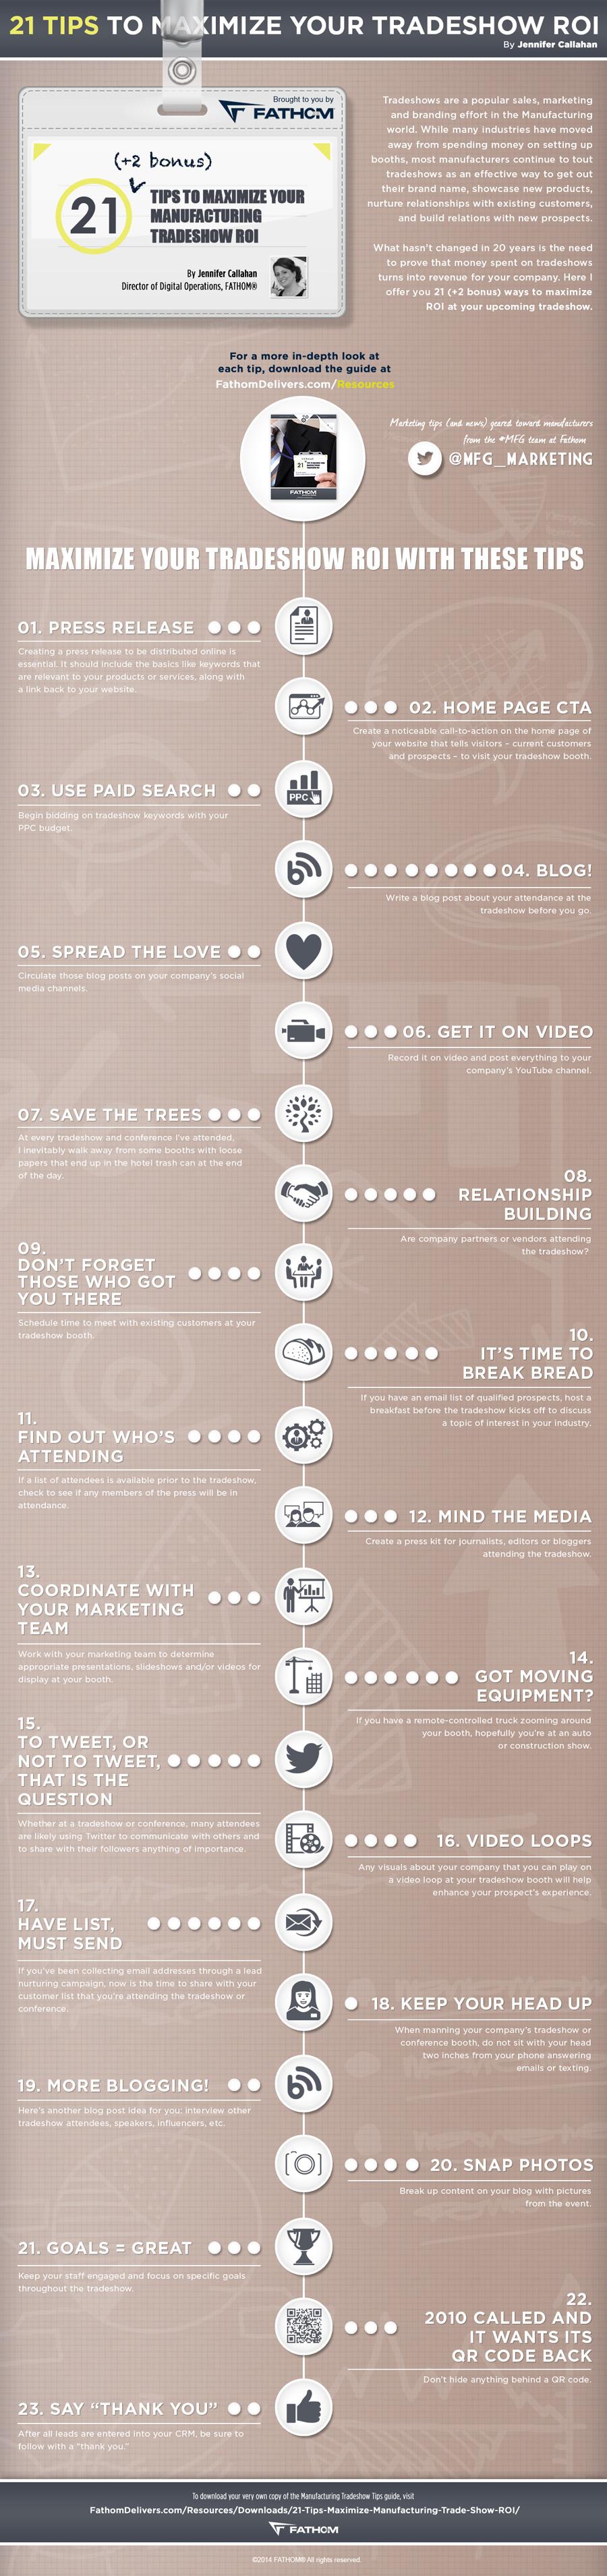 FATHOM_Manufacturing_Tradeshow_ROI_Tips-Infographic_2014